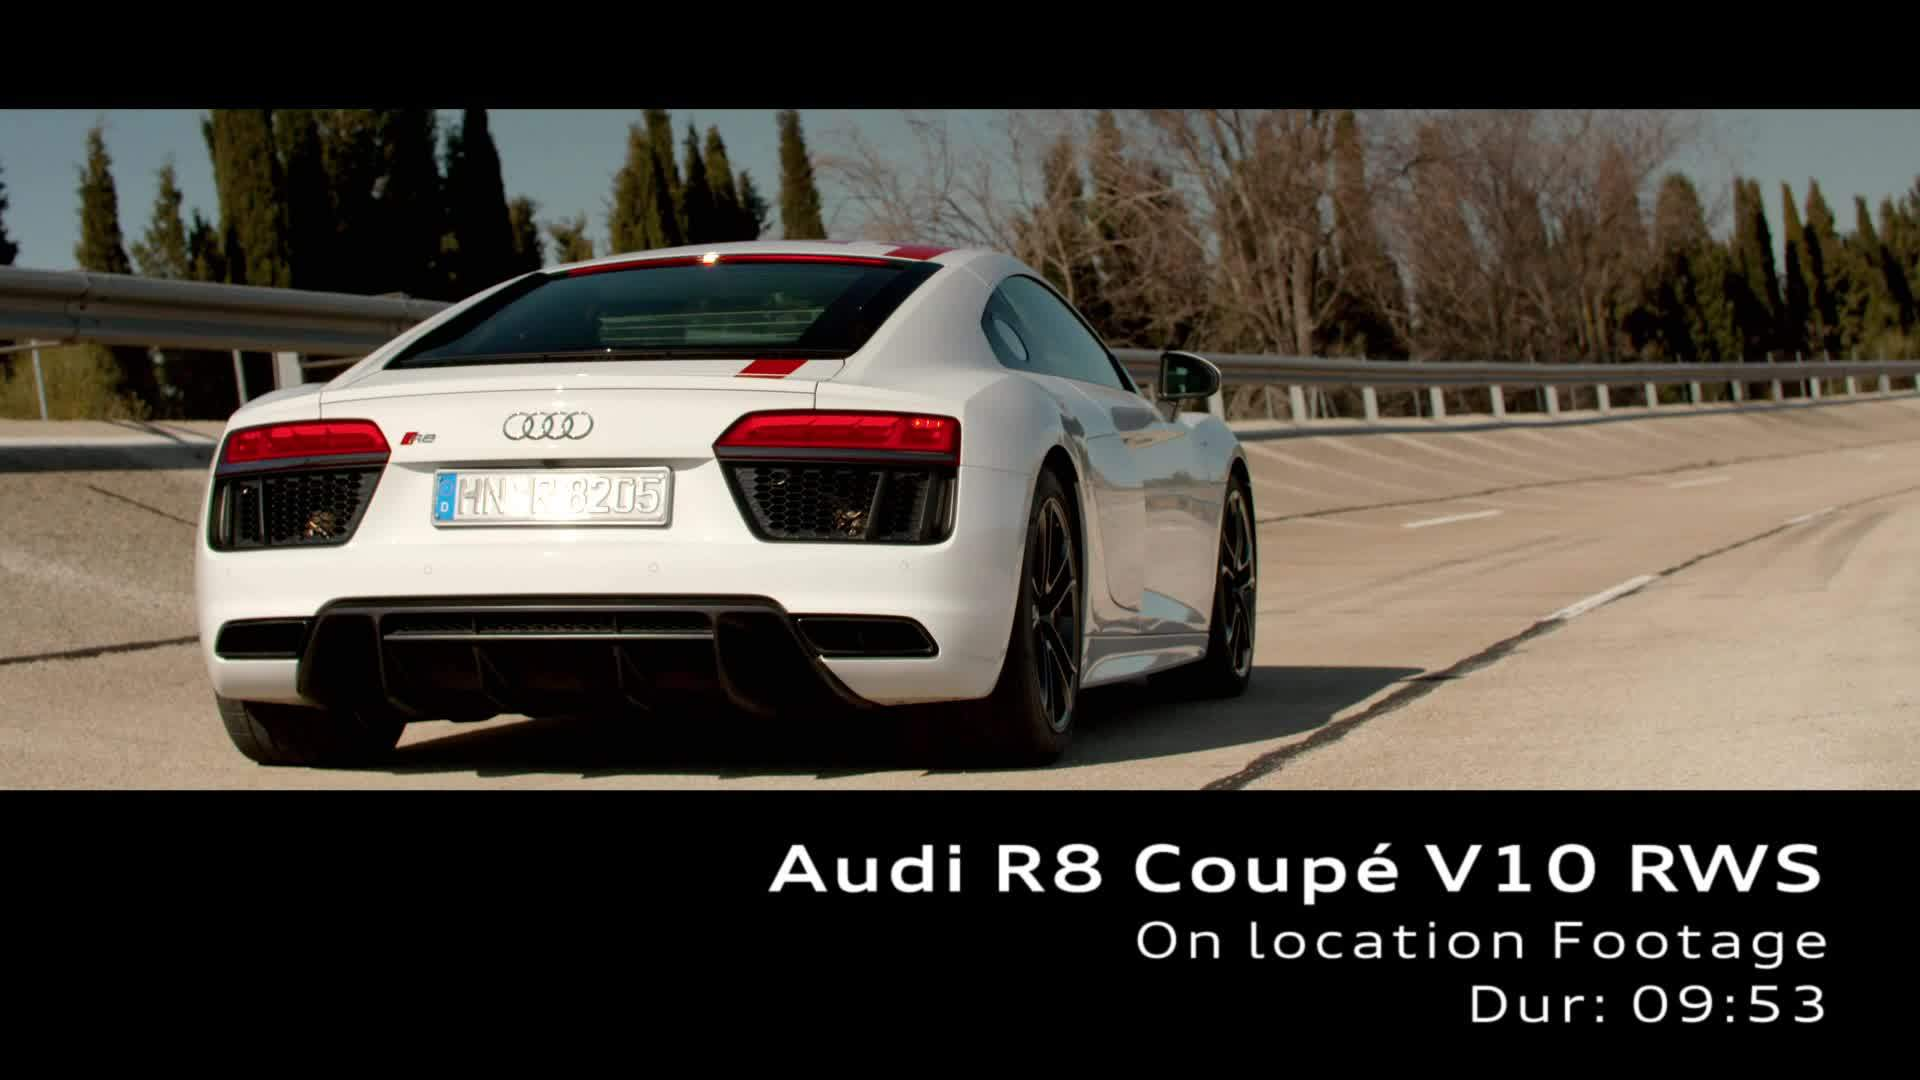 Footage Audi R8 Coupé V10 RWS